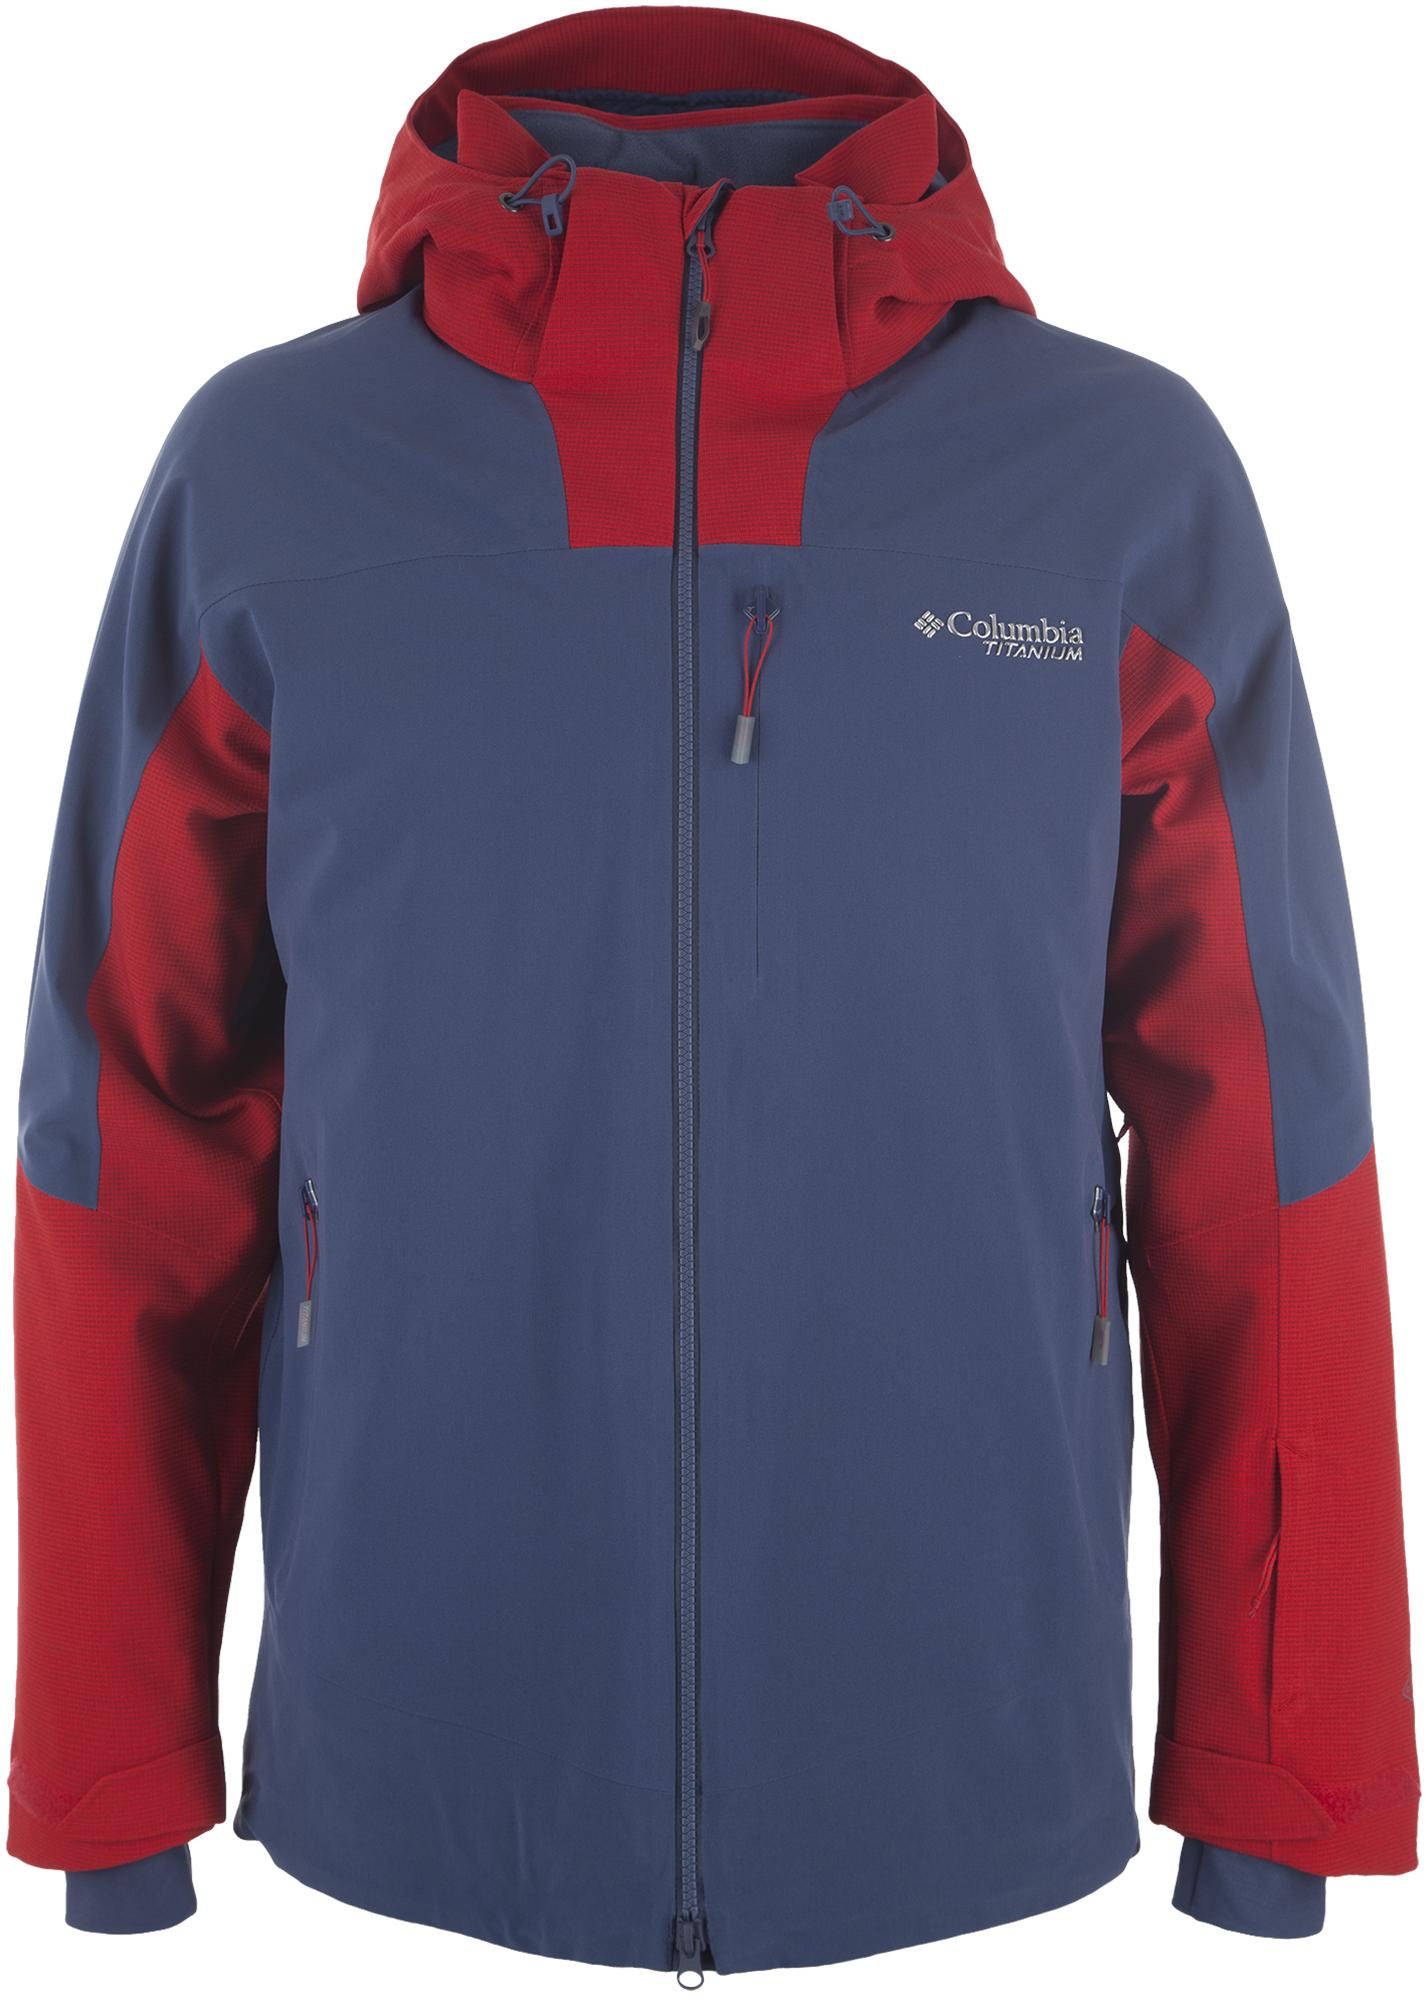 Columbia Куртка утепленная мужская Columbia Powder Keg II, размер 46-48 цена